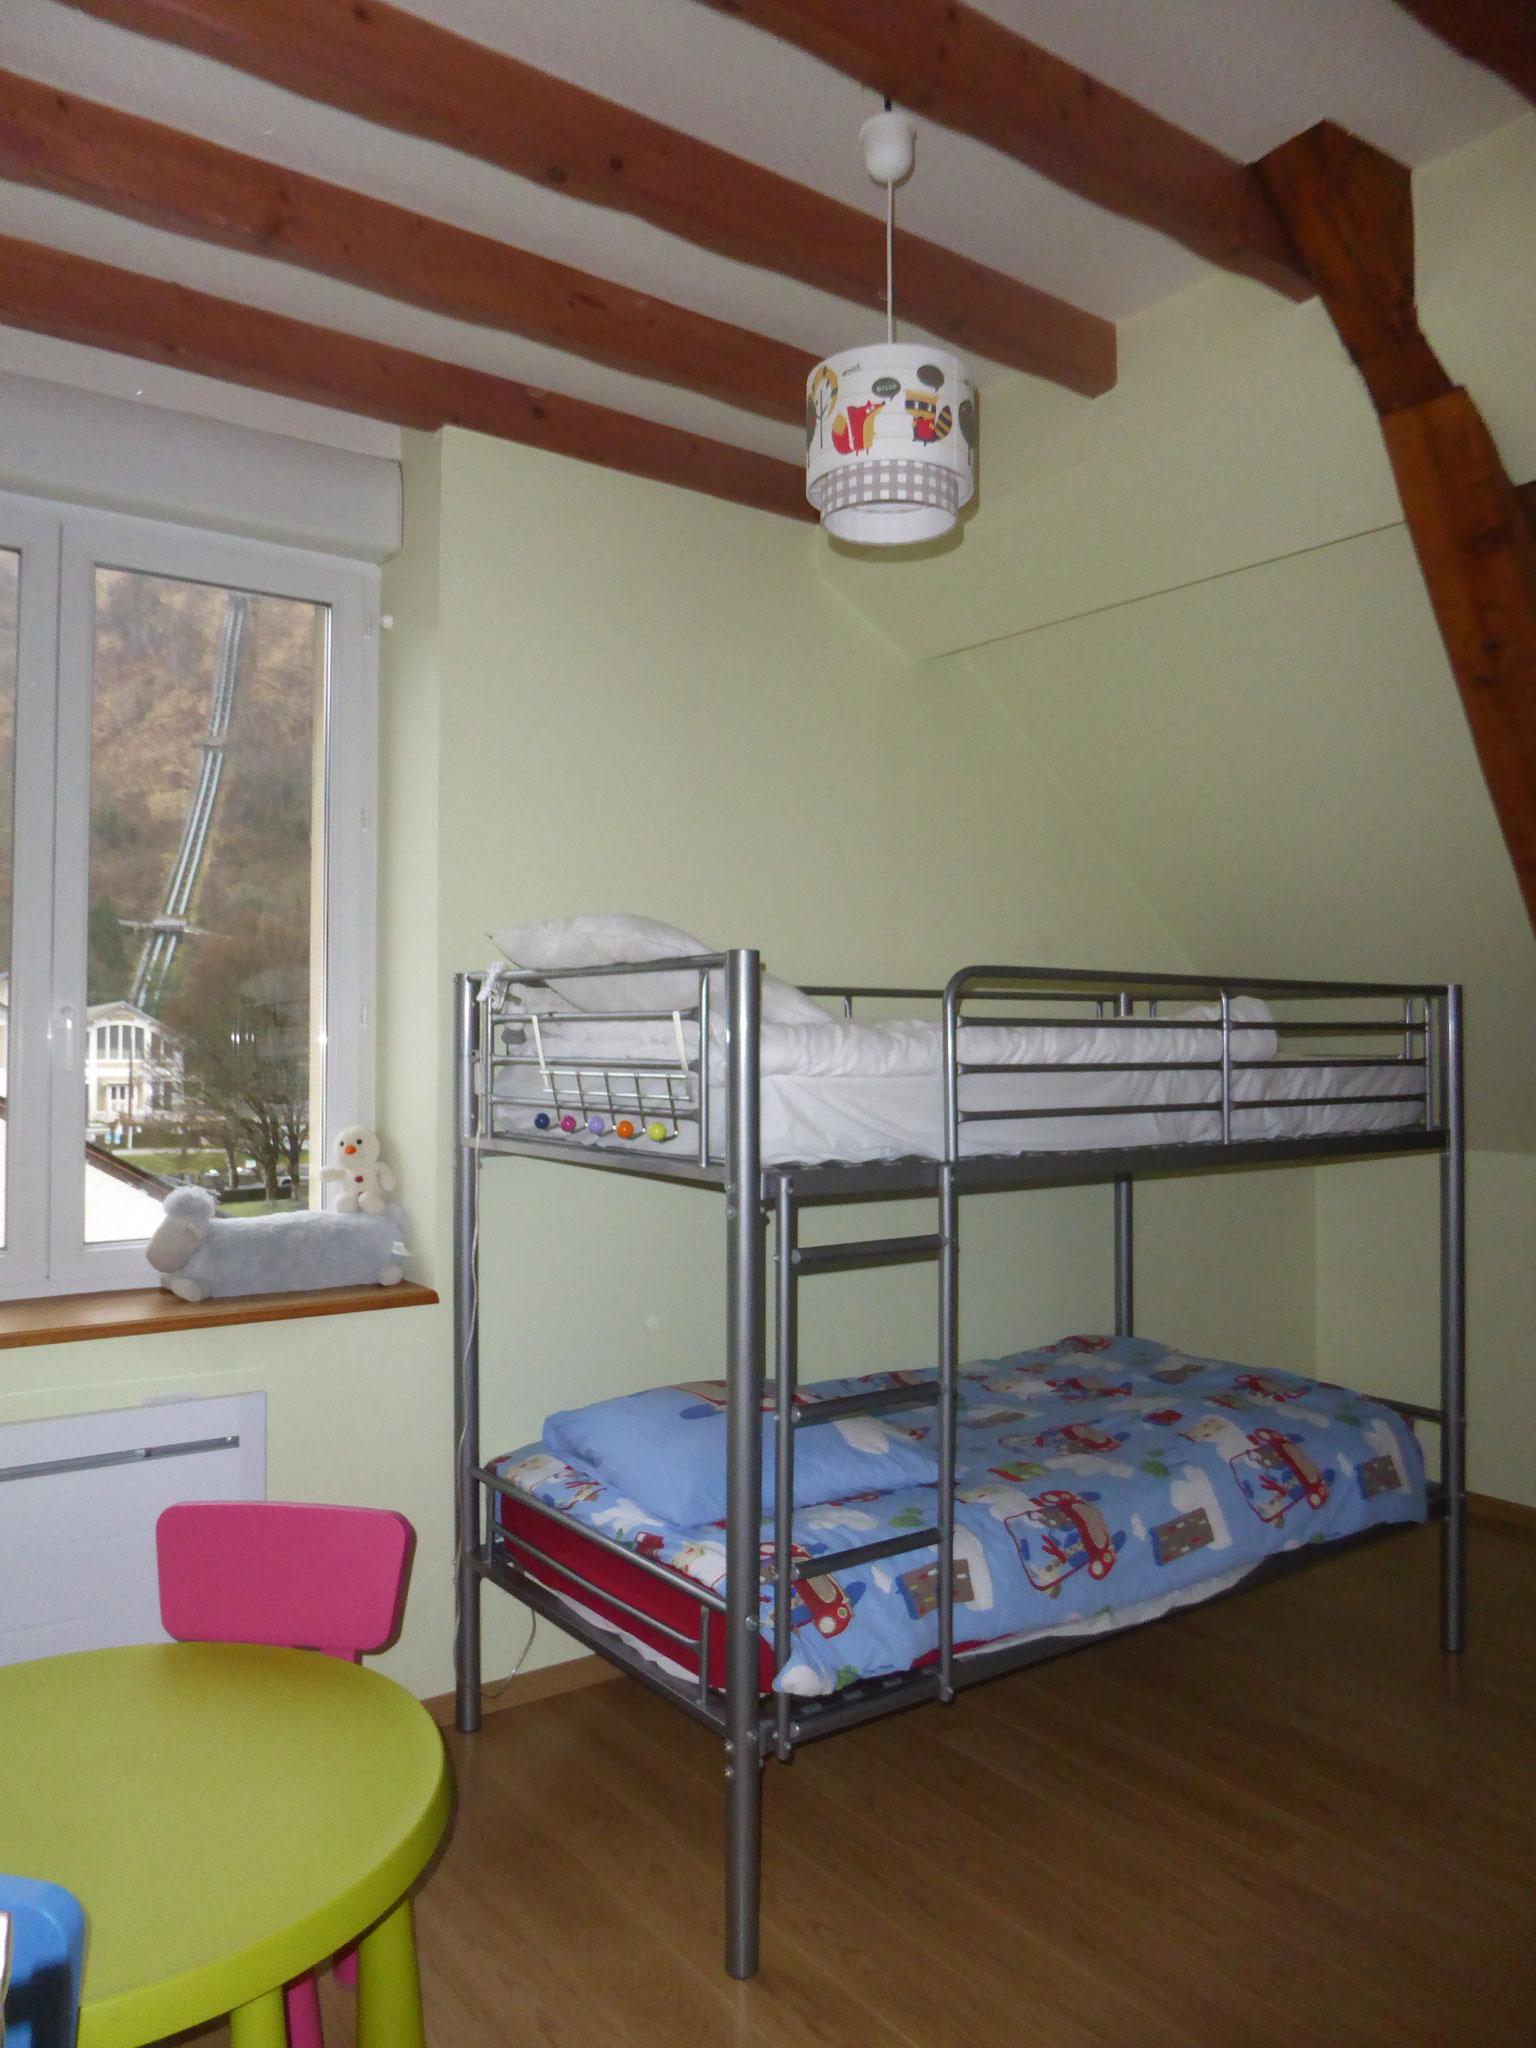 La chambre avec lits superposés en 90, matelas neufs